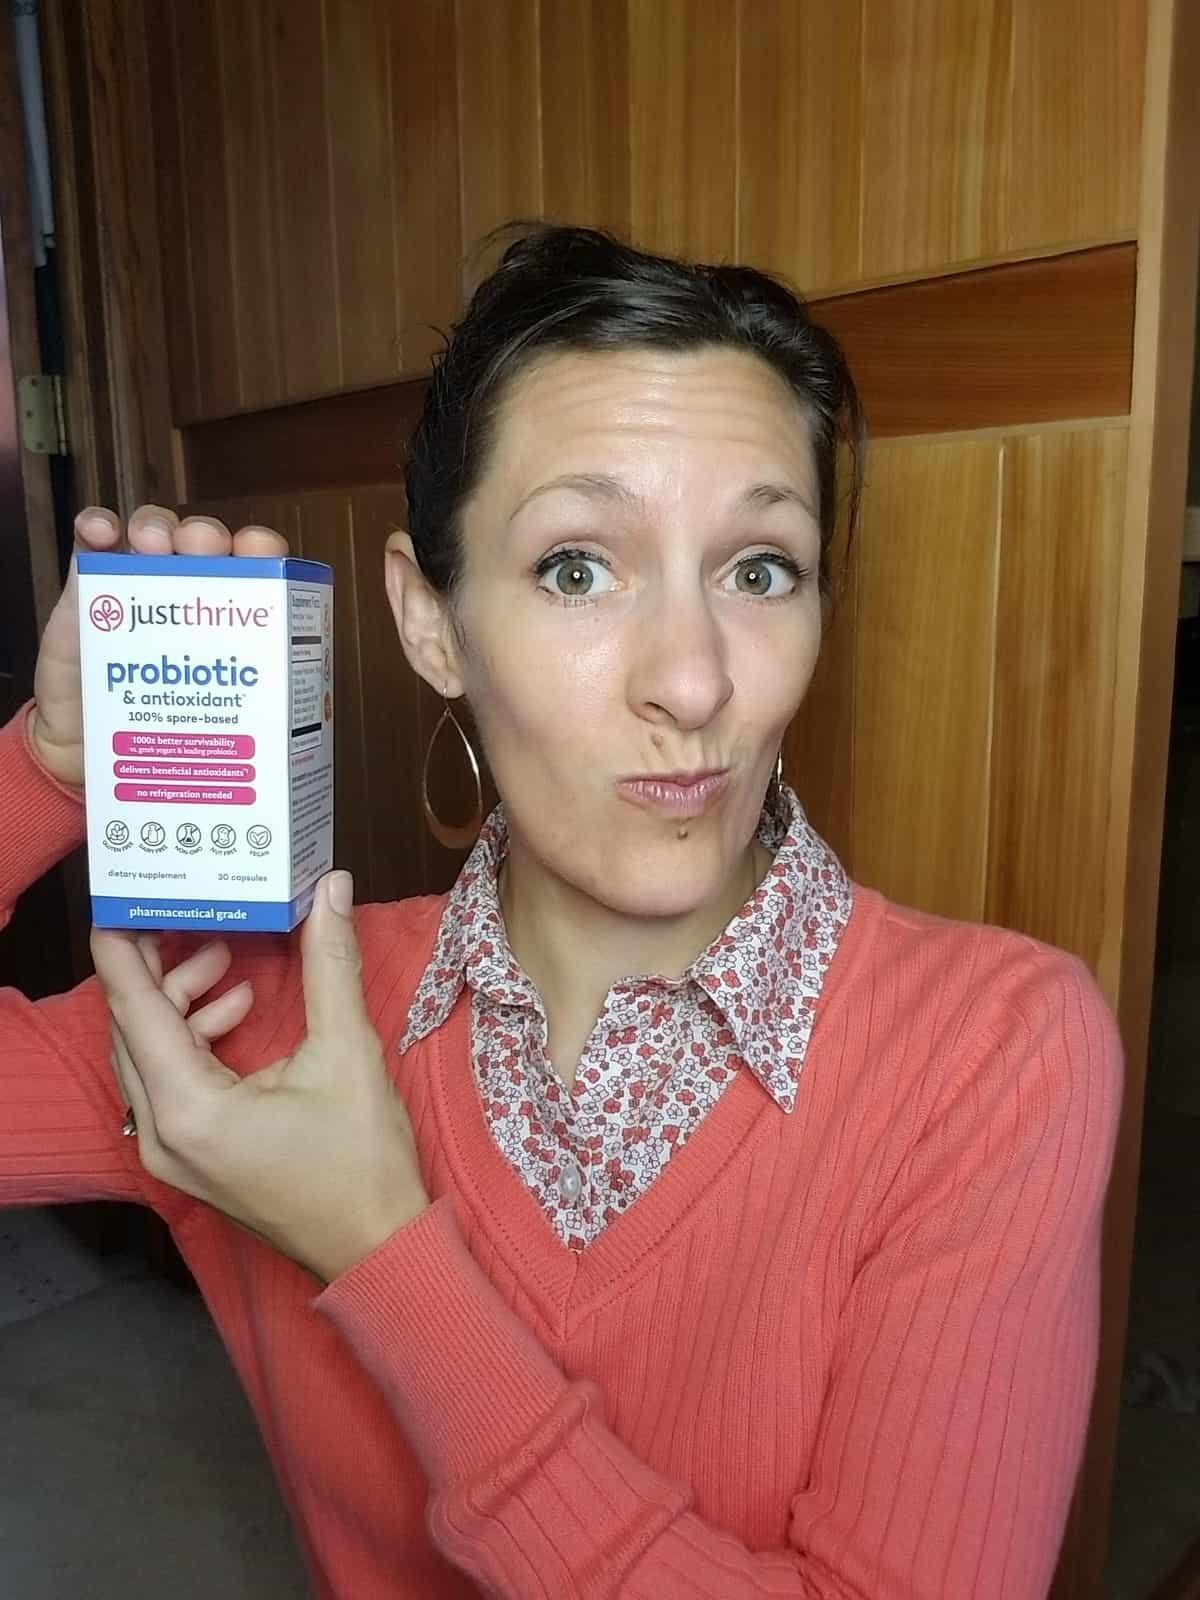 JustThrive probiotic